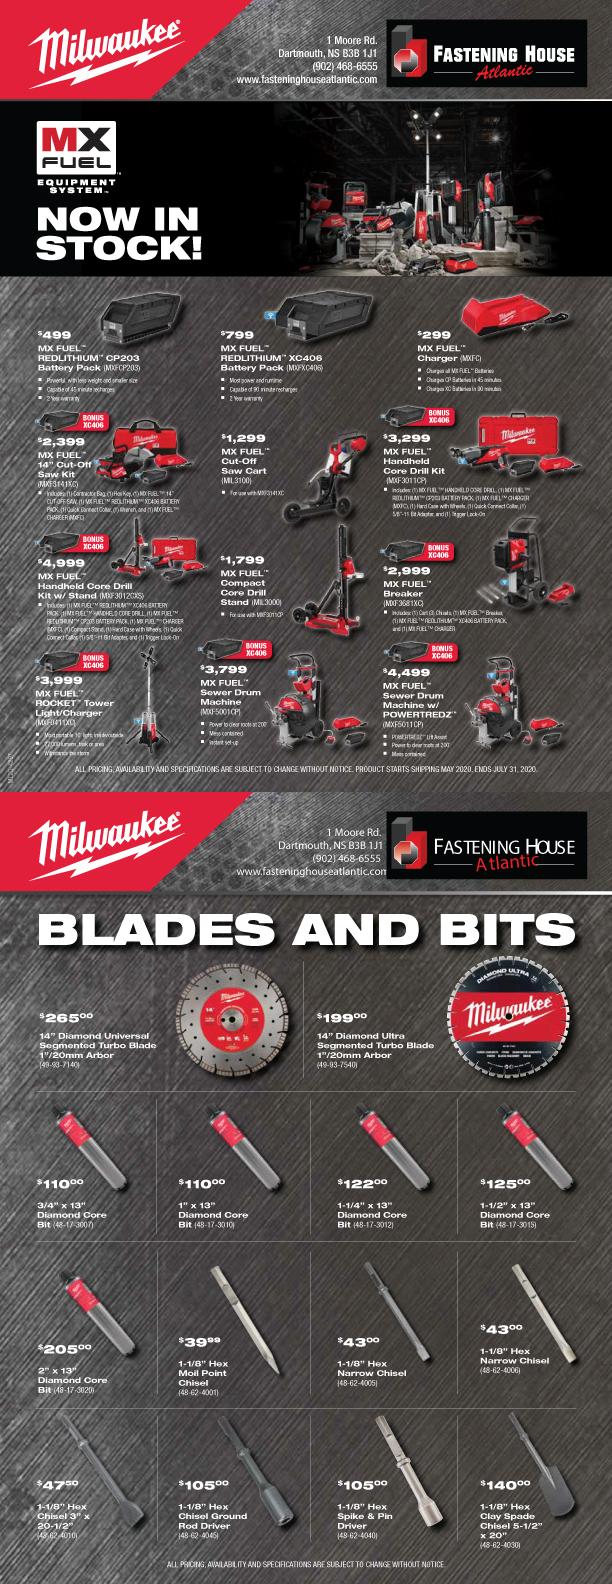 Now In Stock MX Tools & Diamond Blades & Bits